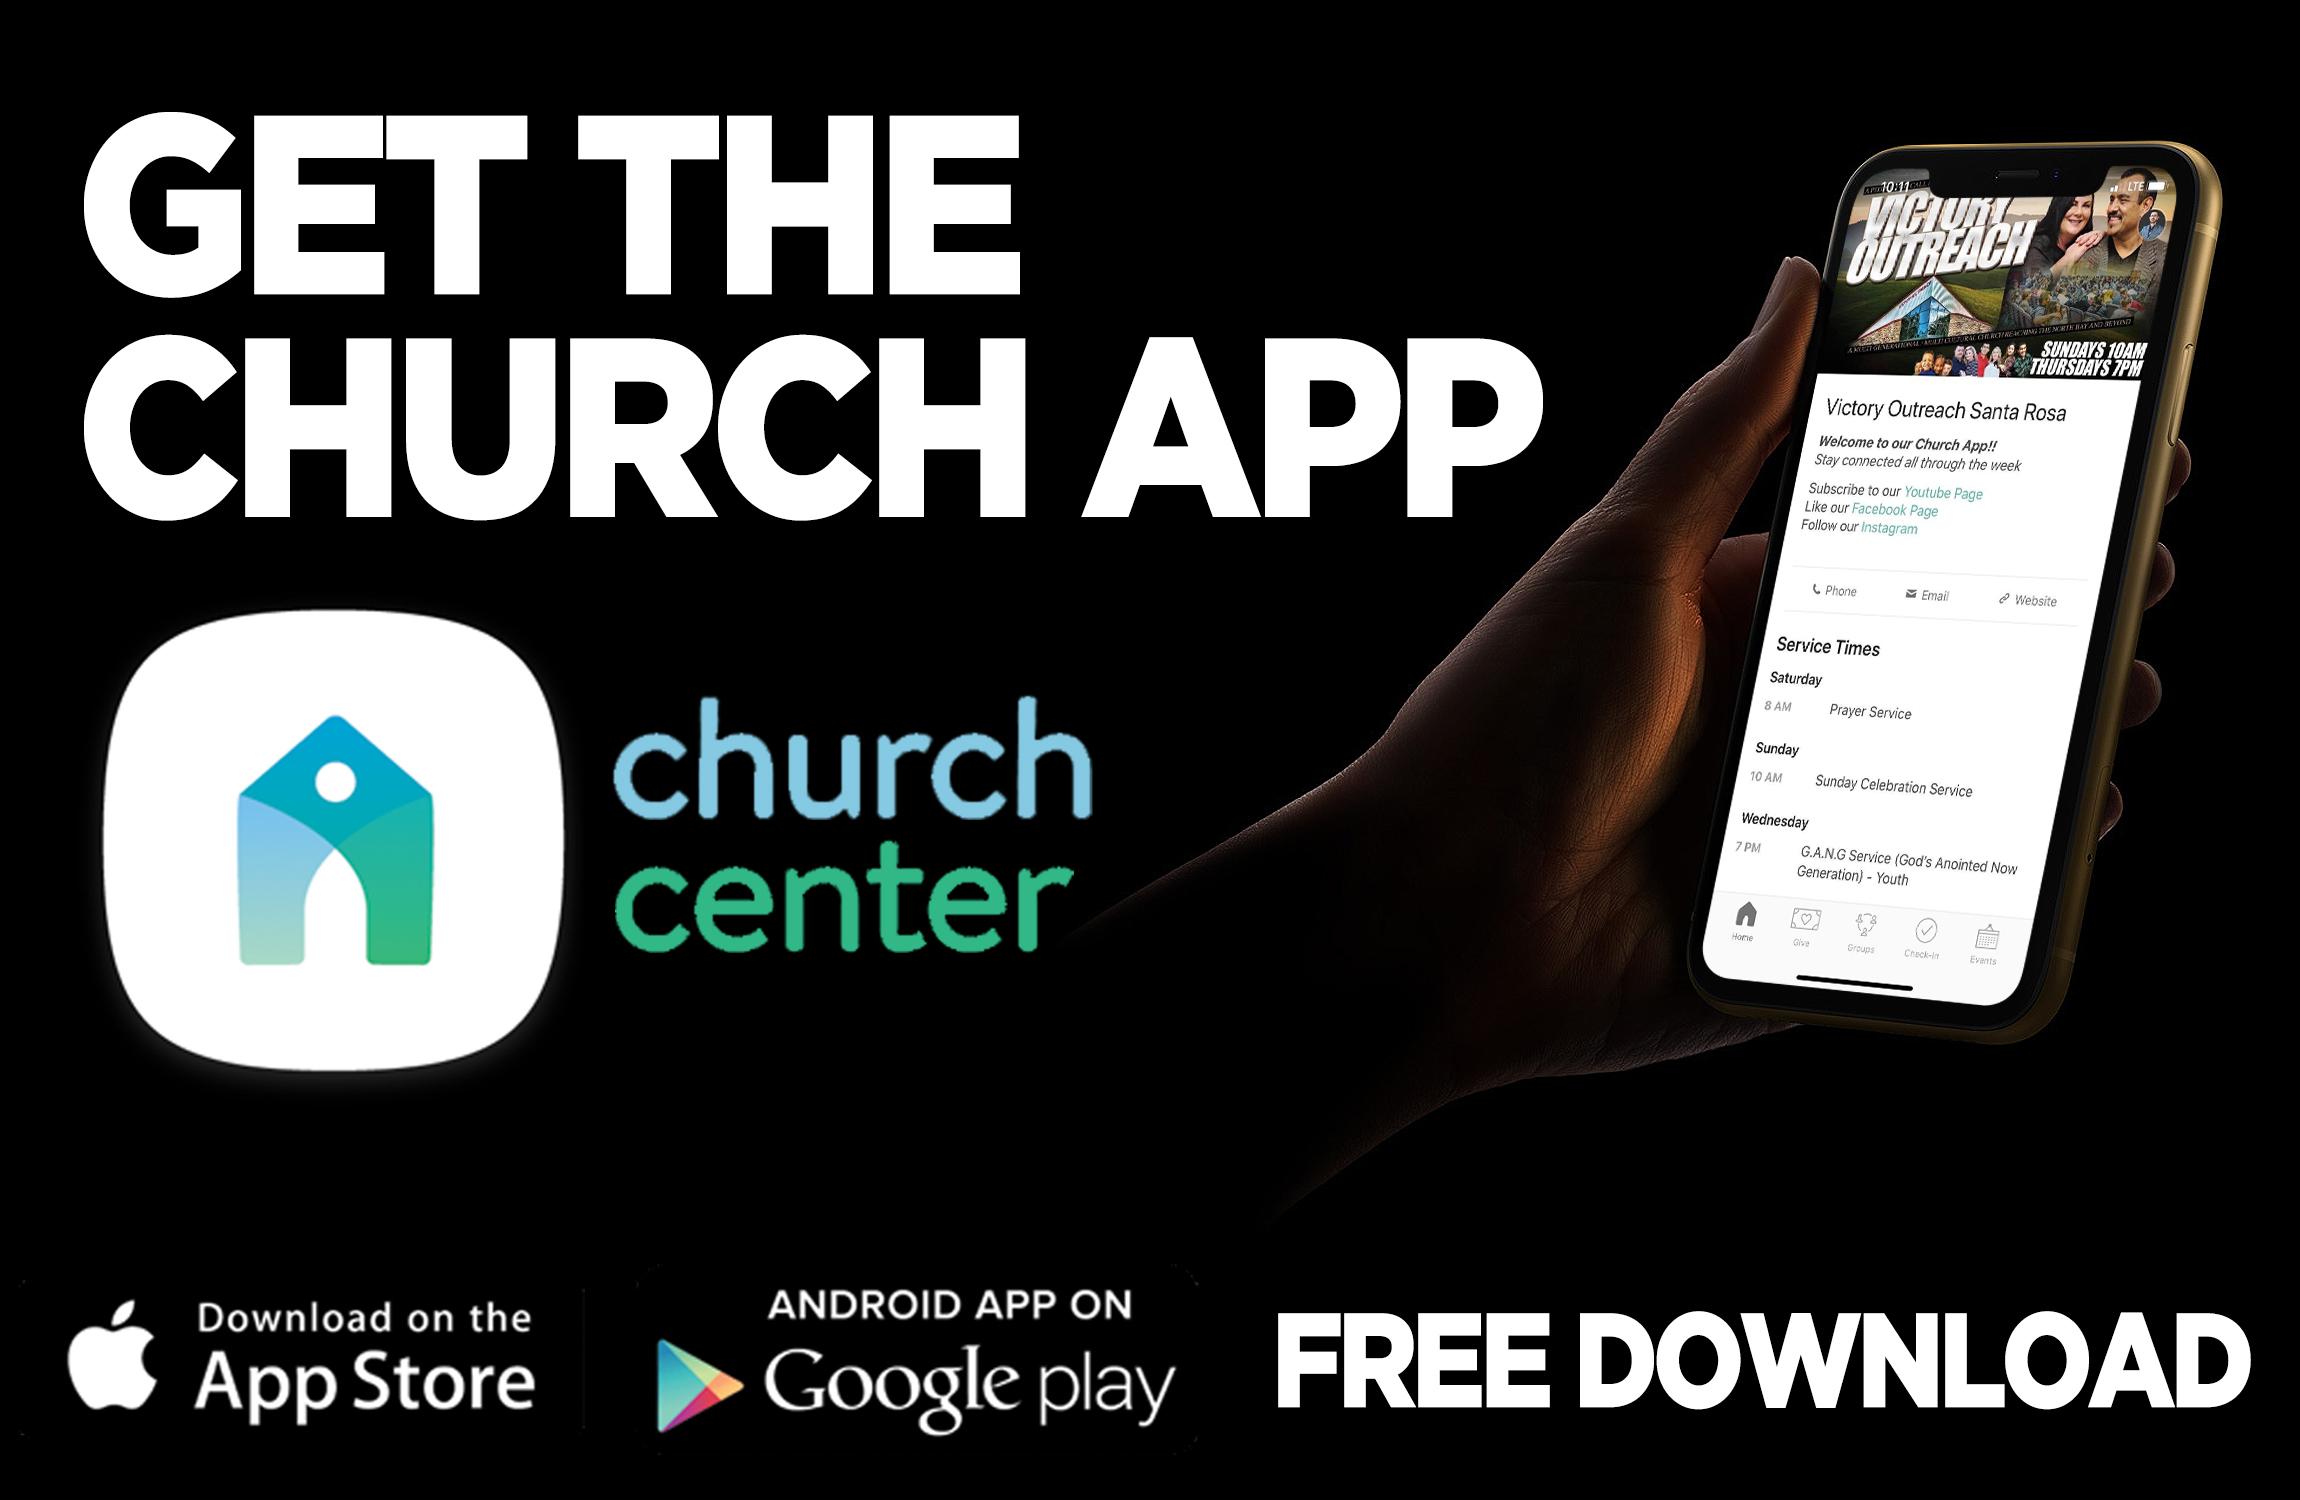 CHURCH APP SCREENS